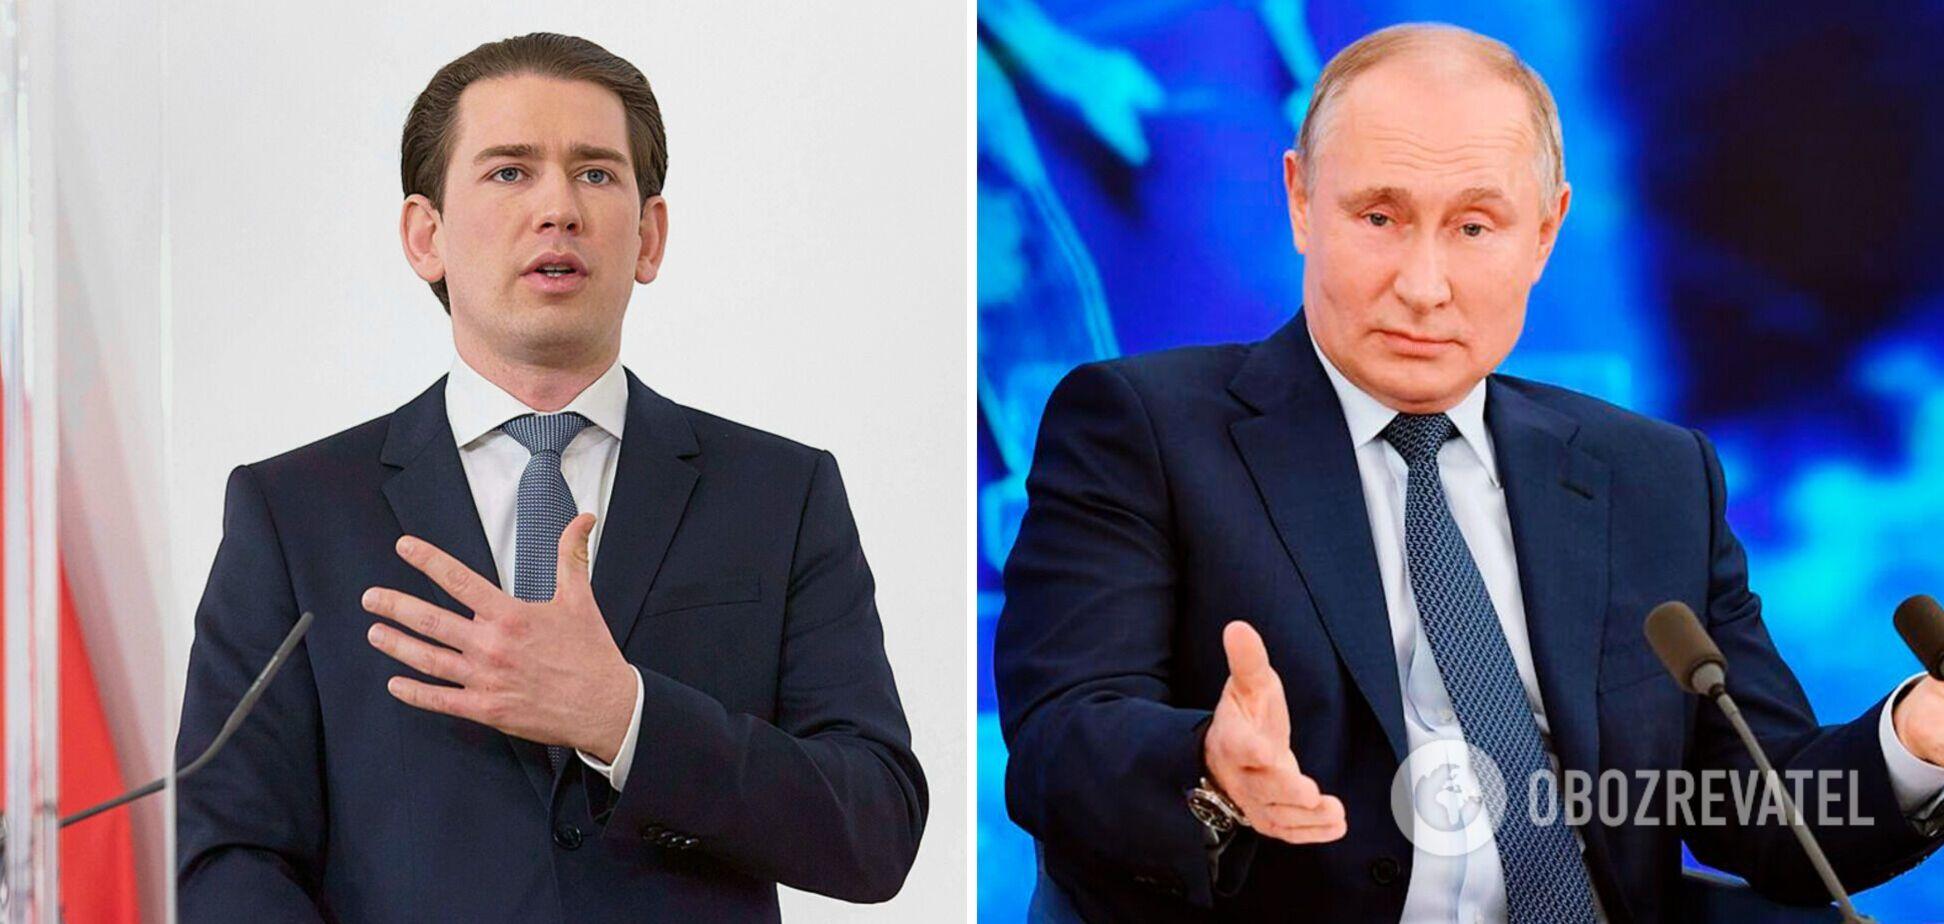 Себастьян Курц і Володимир Путін